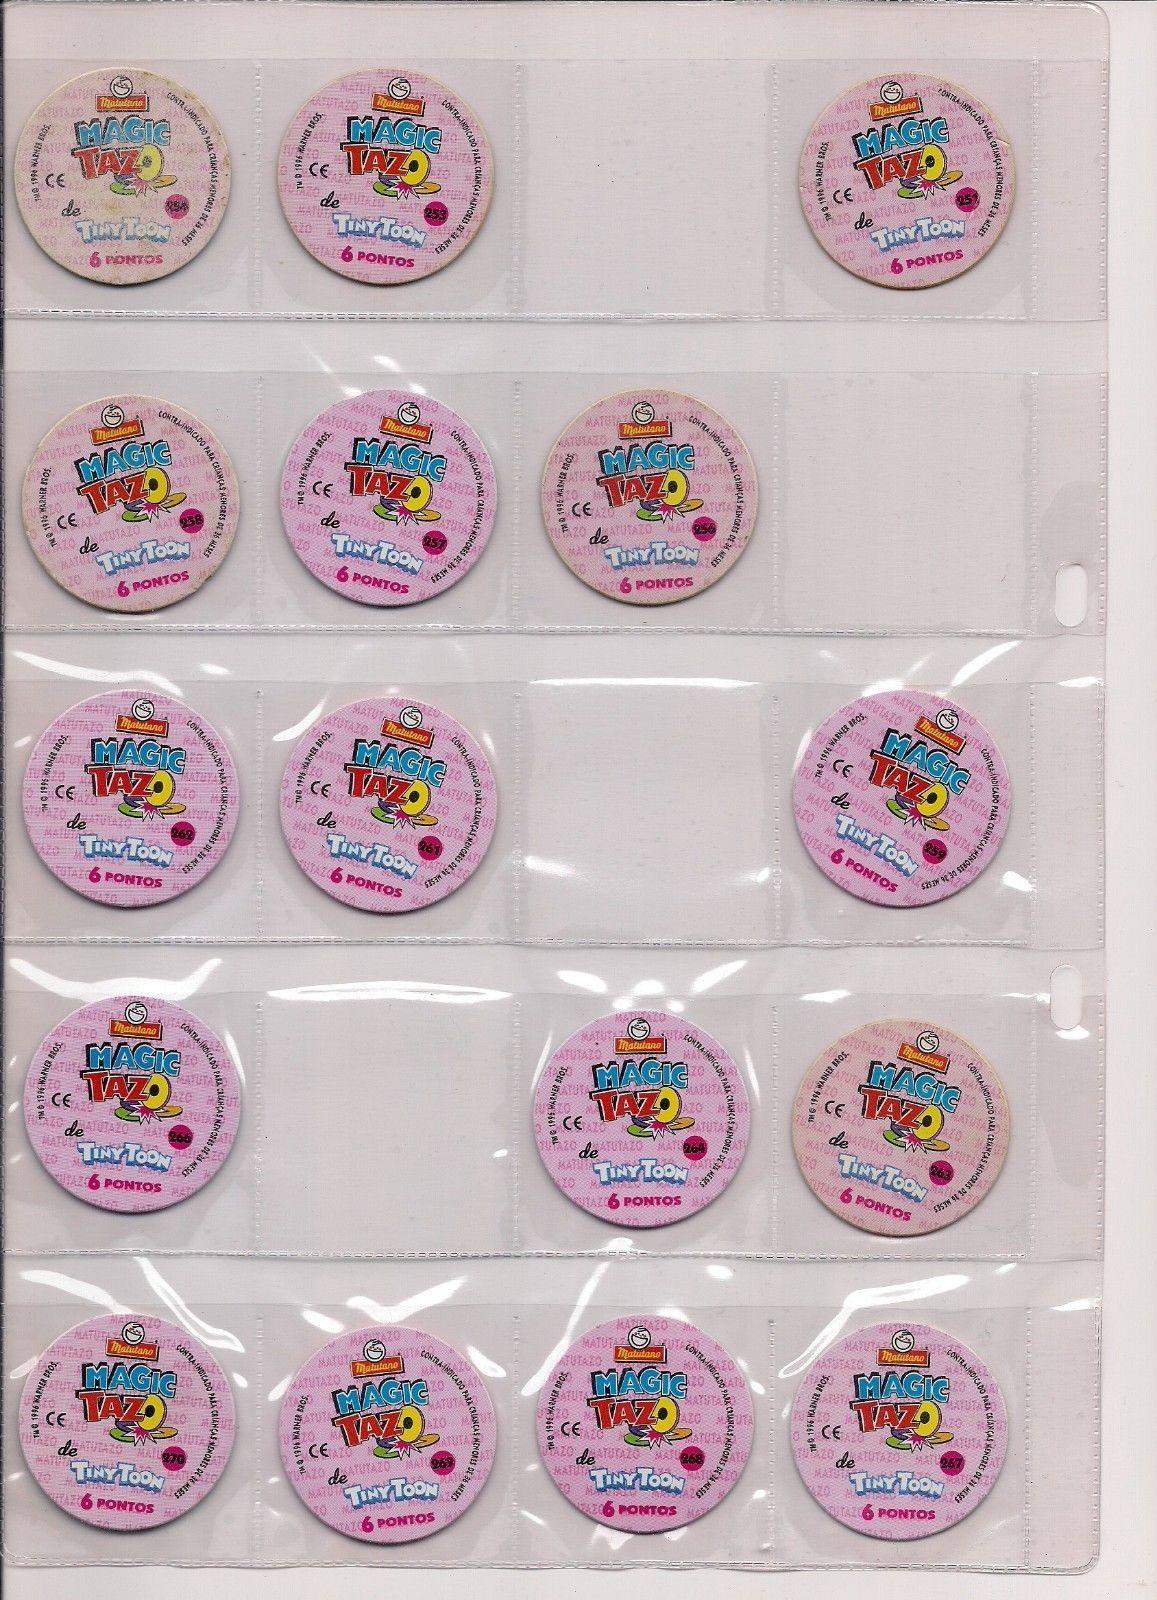 Rare Magic Lenticular Tazos Pogs Lot X 16 and 50 similar items